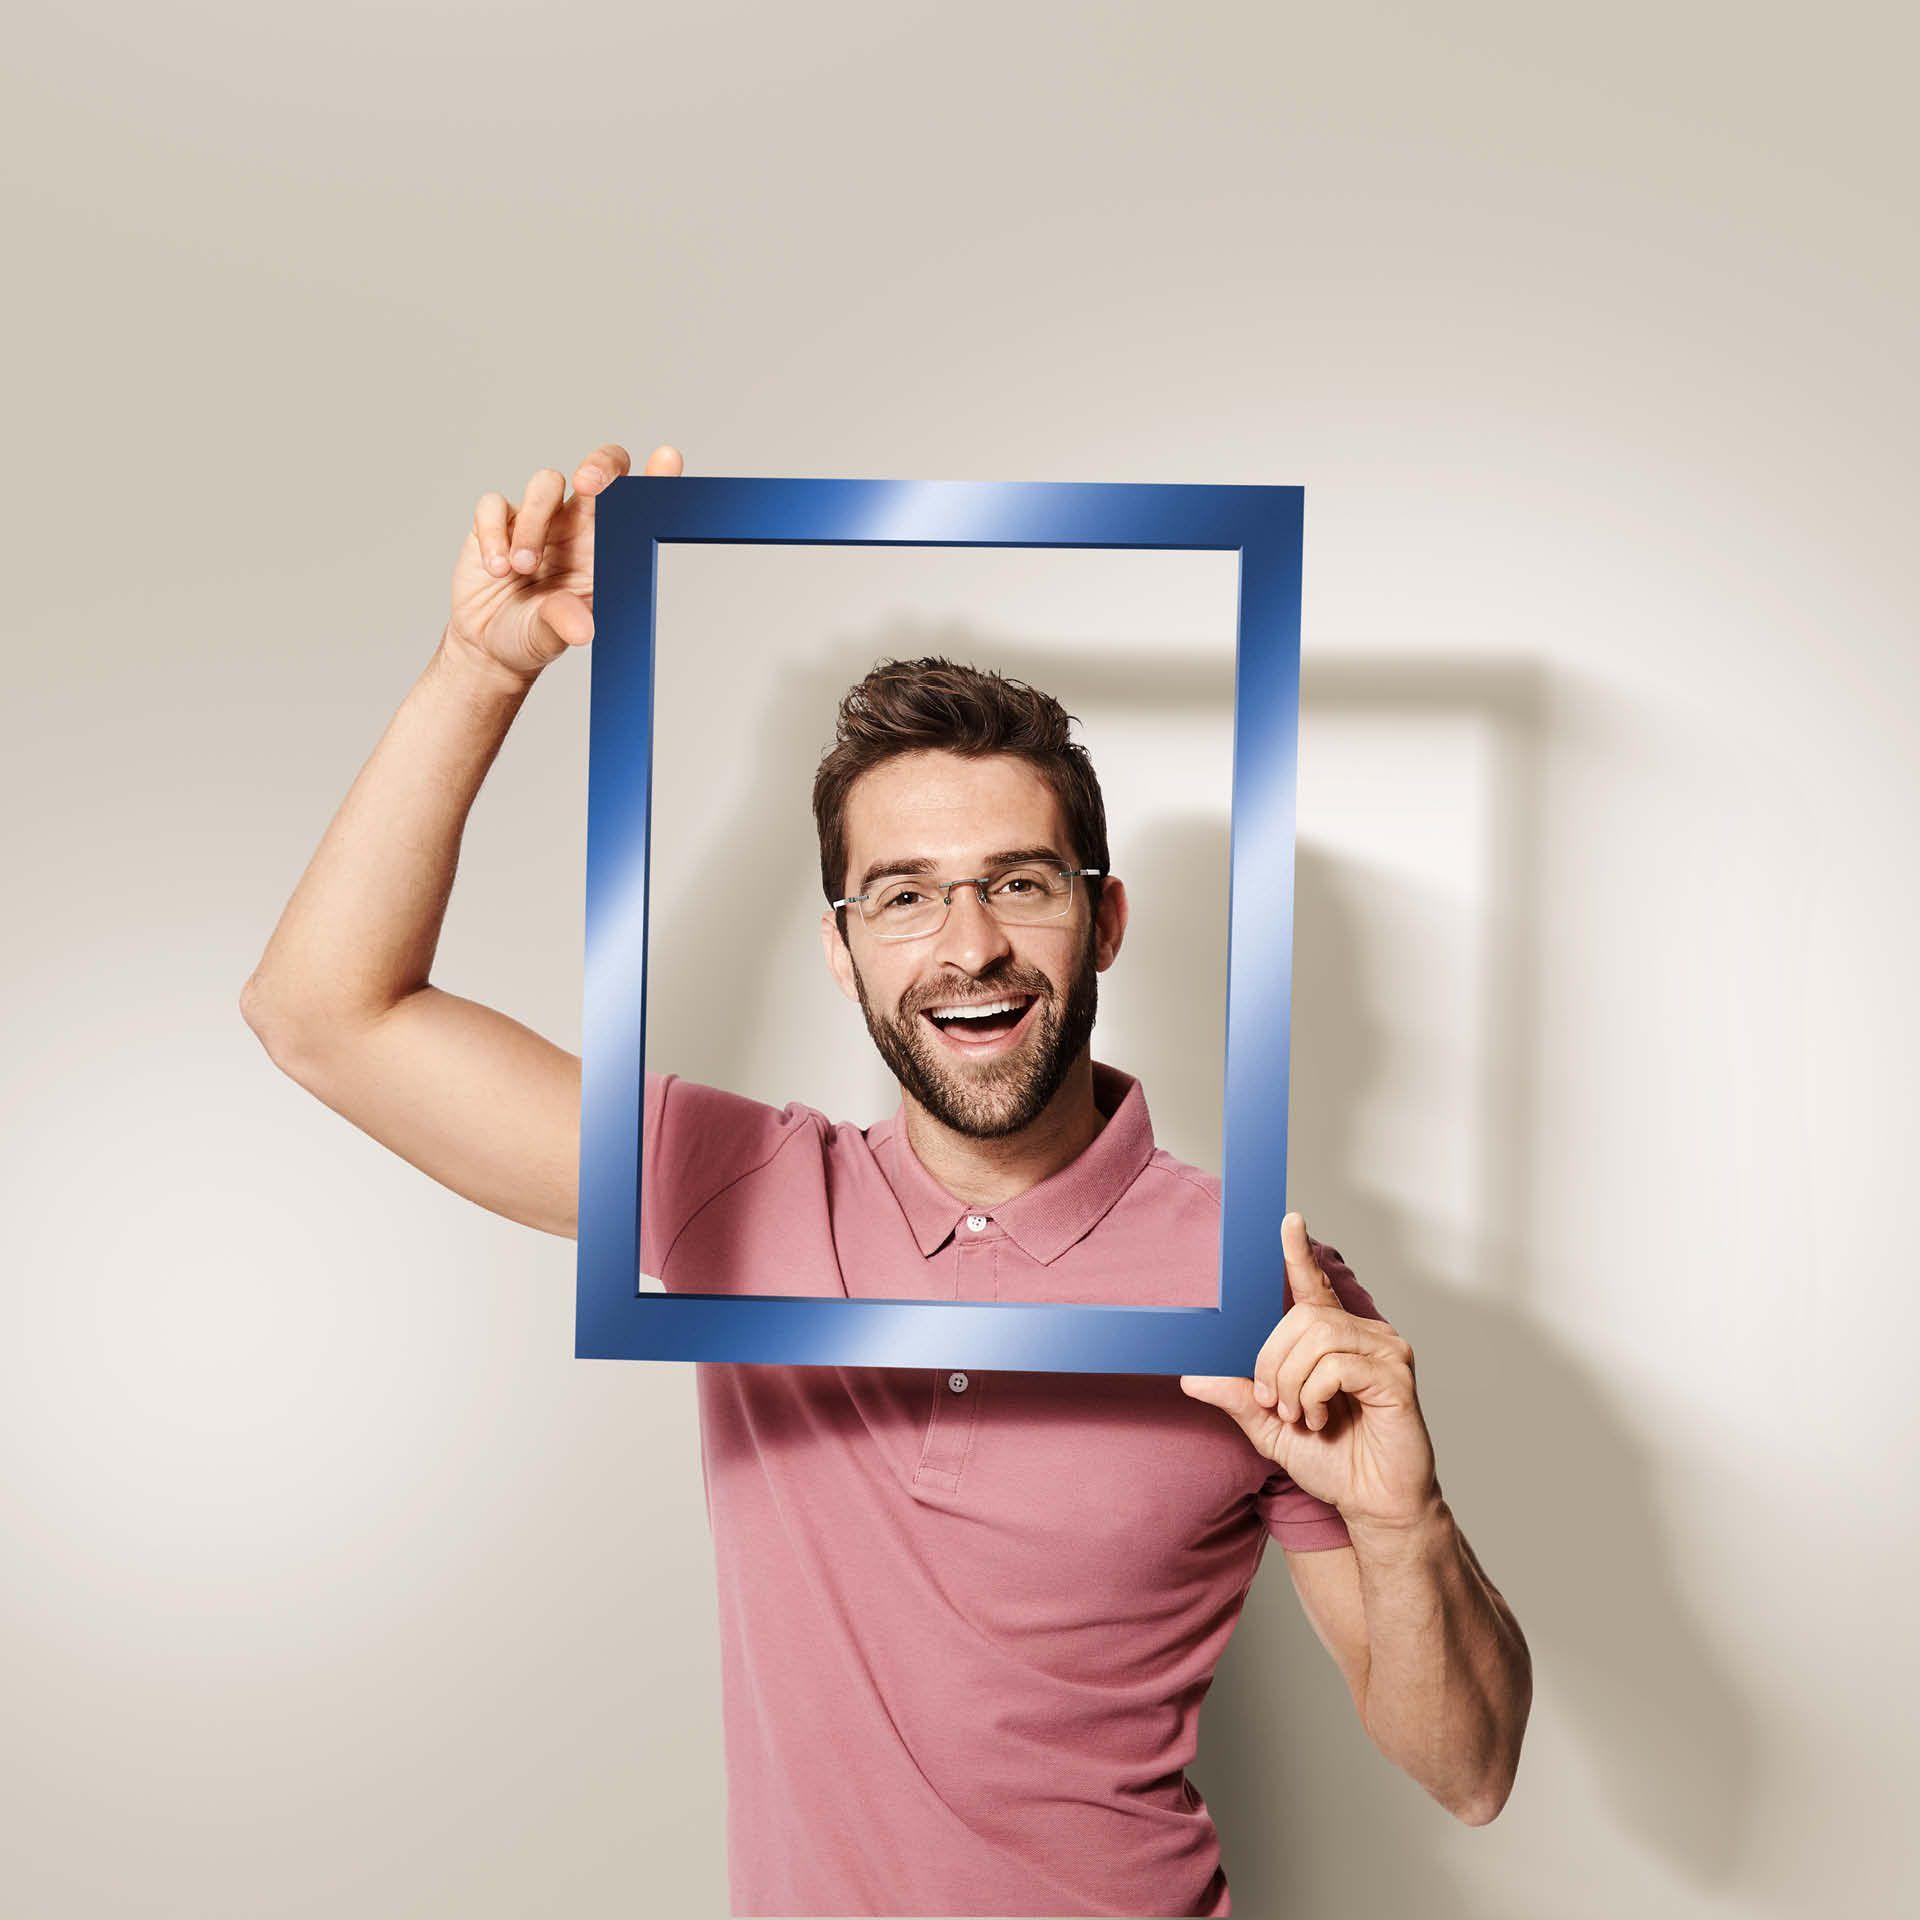 cr Basel Werbeagentur corner bank imagekampagne bildkonzept